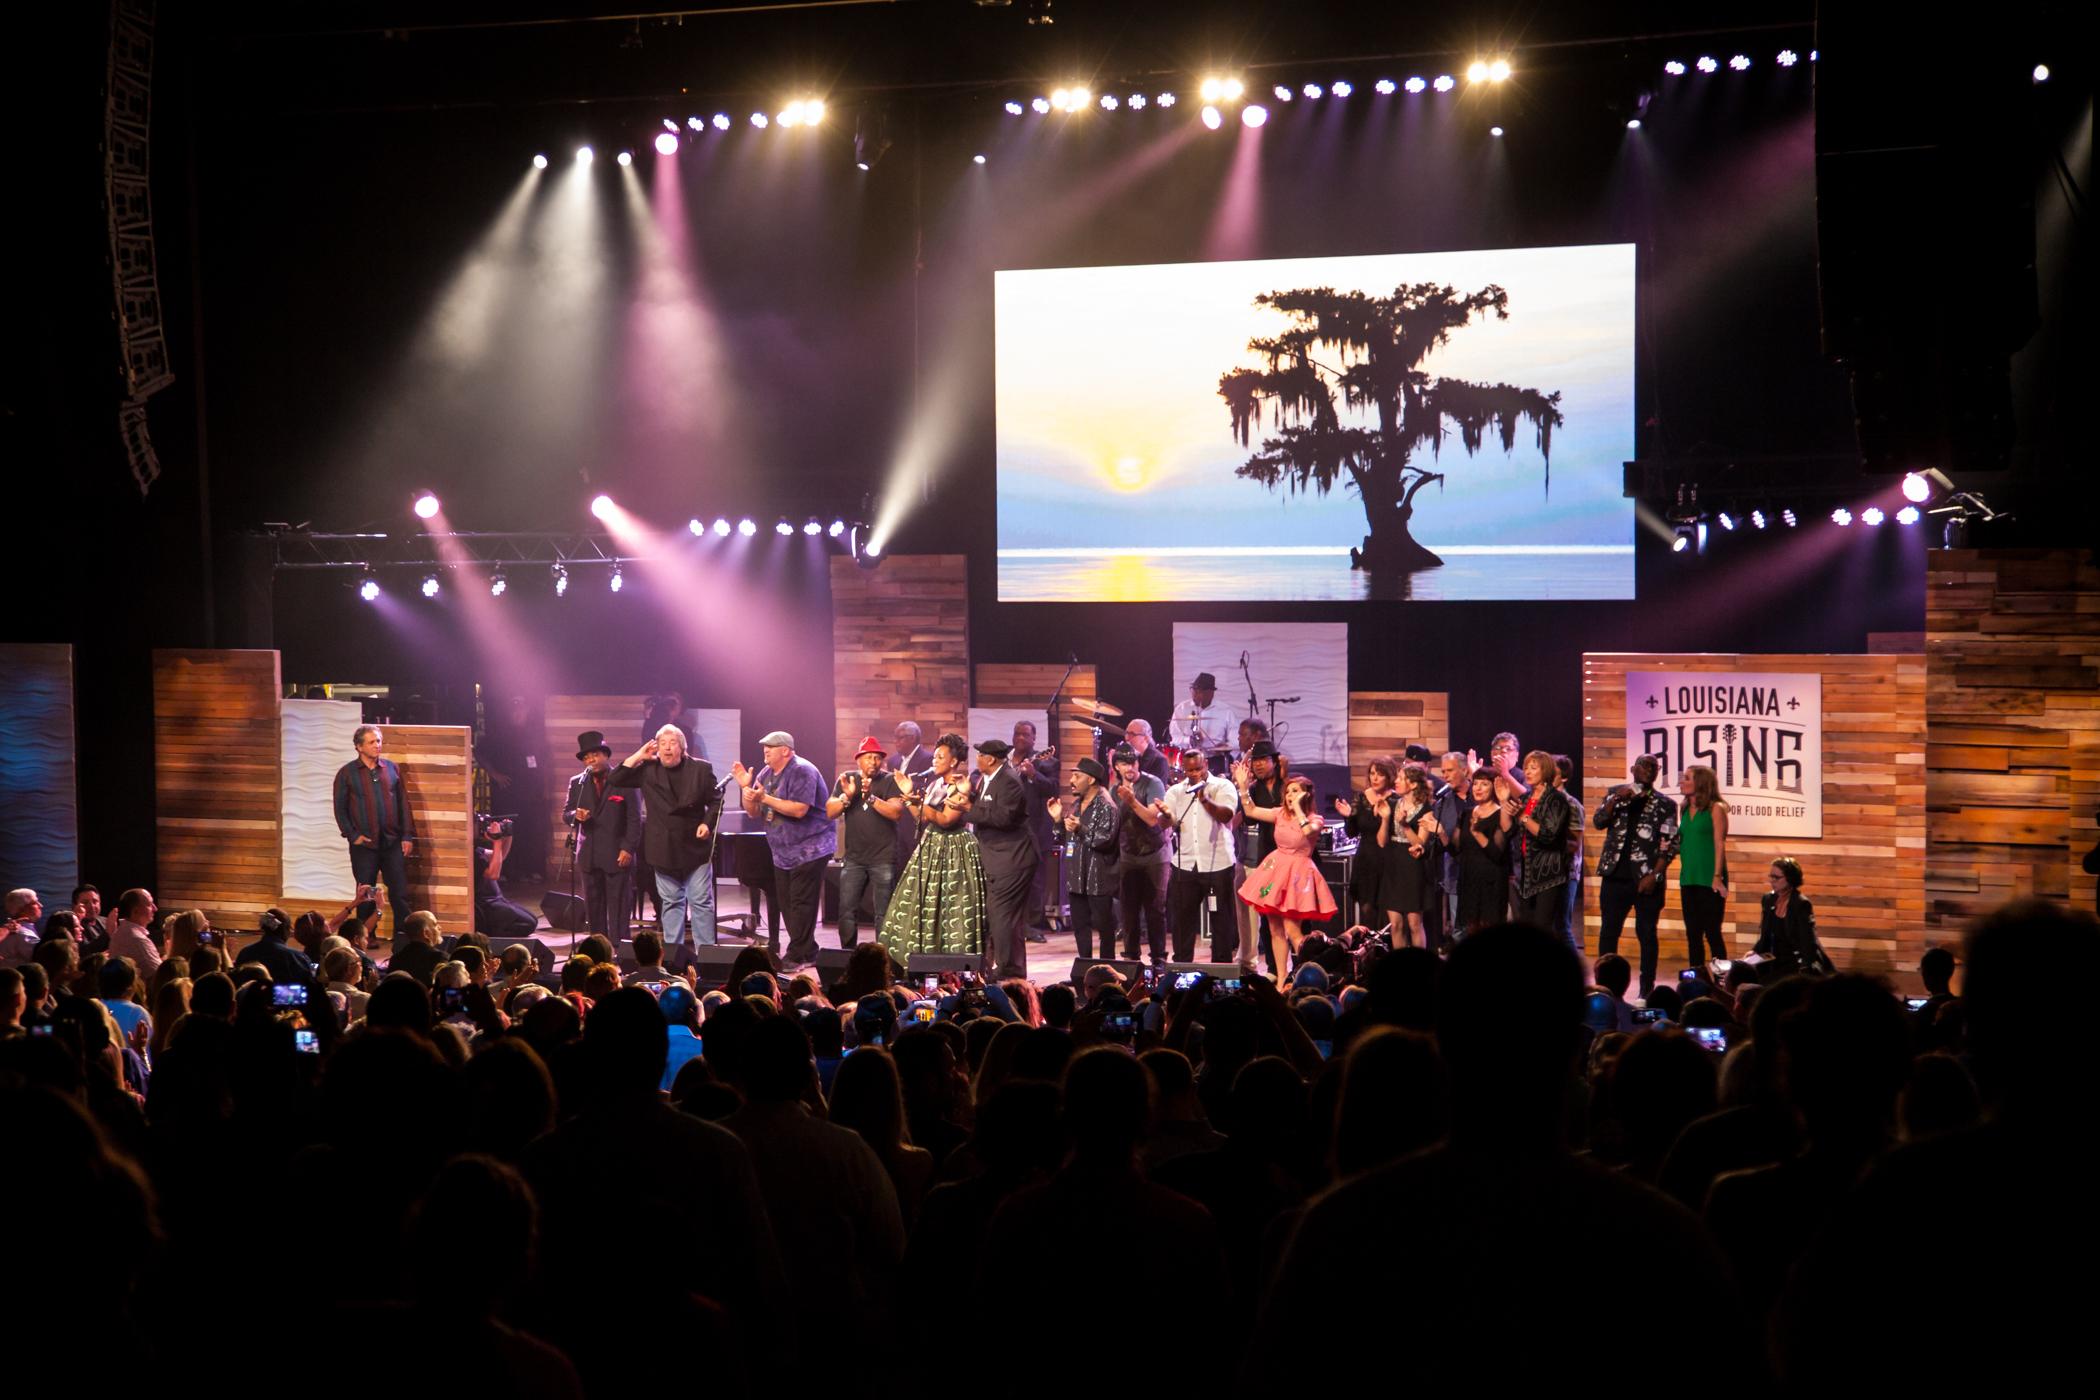 Louisiana Rising Concert Picture